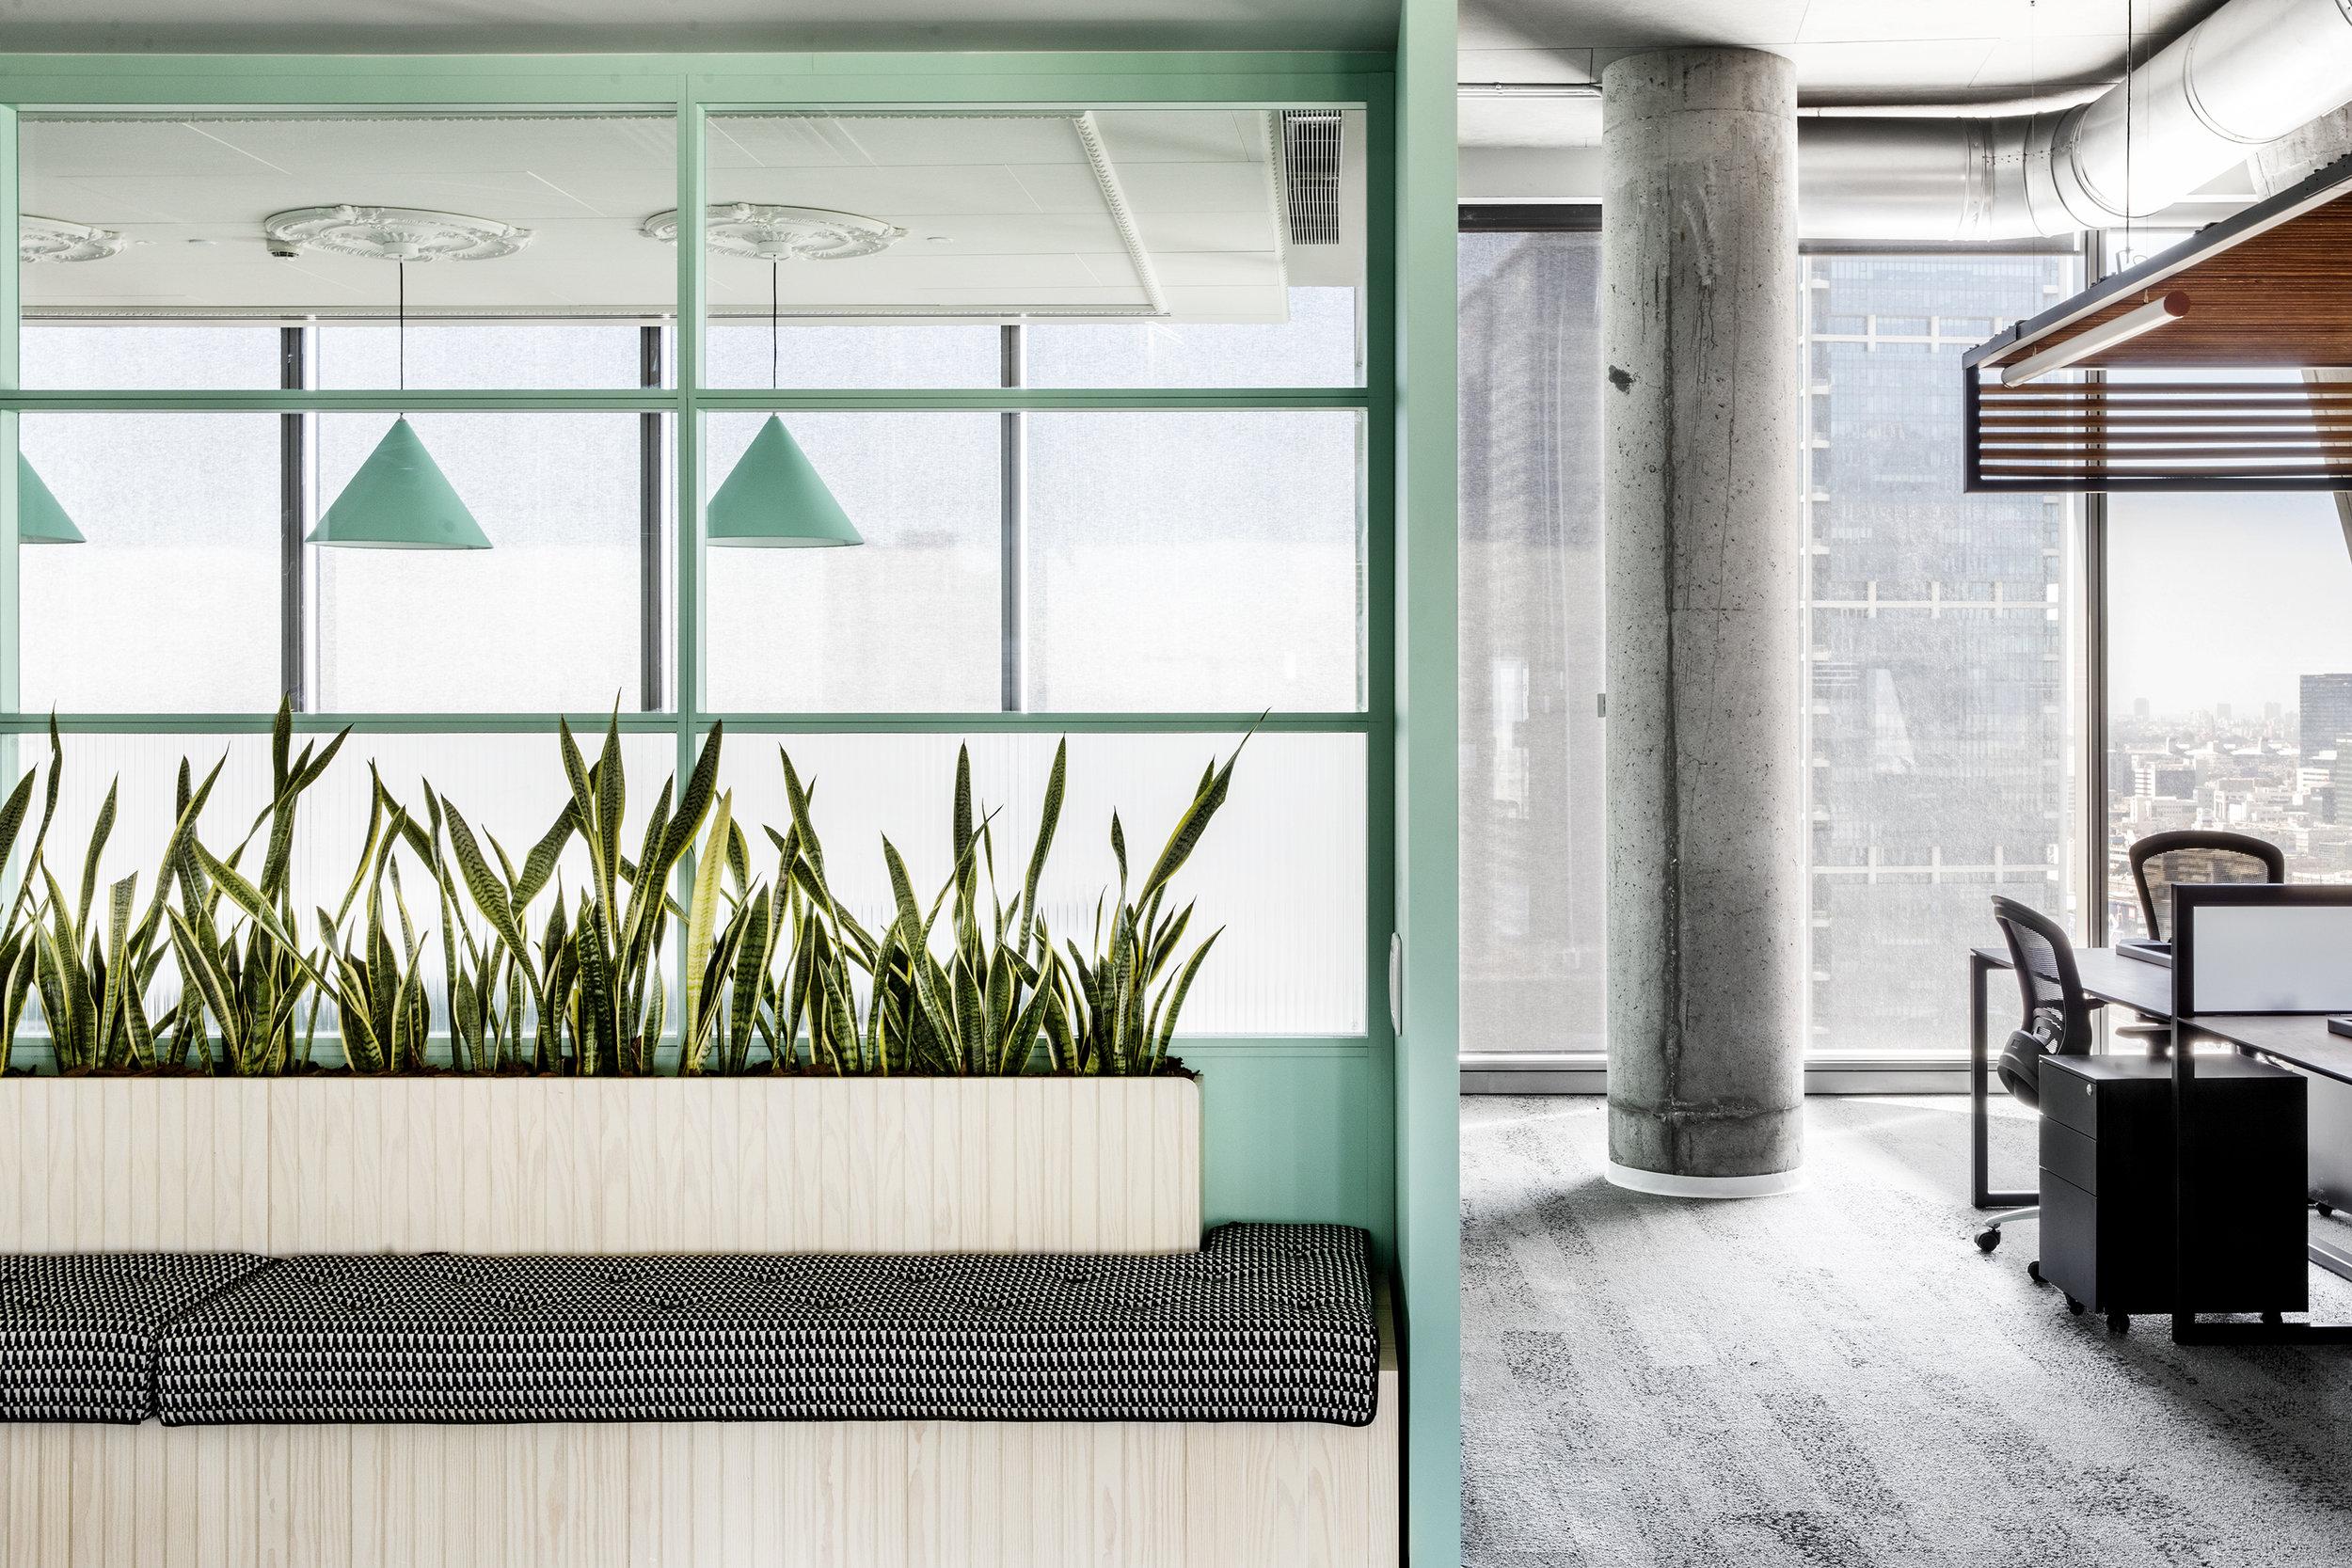 רואי דוד אדריכלות - אדריכל - נטורל אינטליג'נס - ROY DAVID - ARCHITECTURE - ARCHITECT - NI (21).jpg